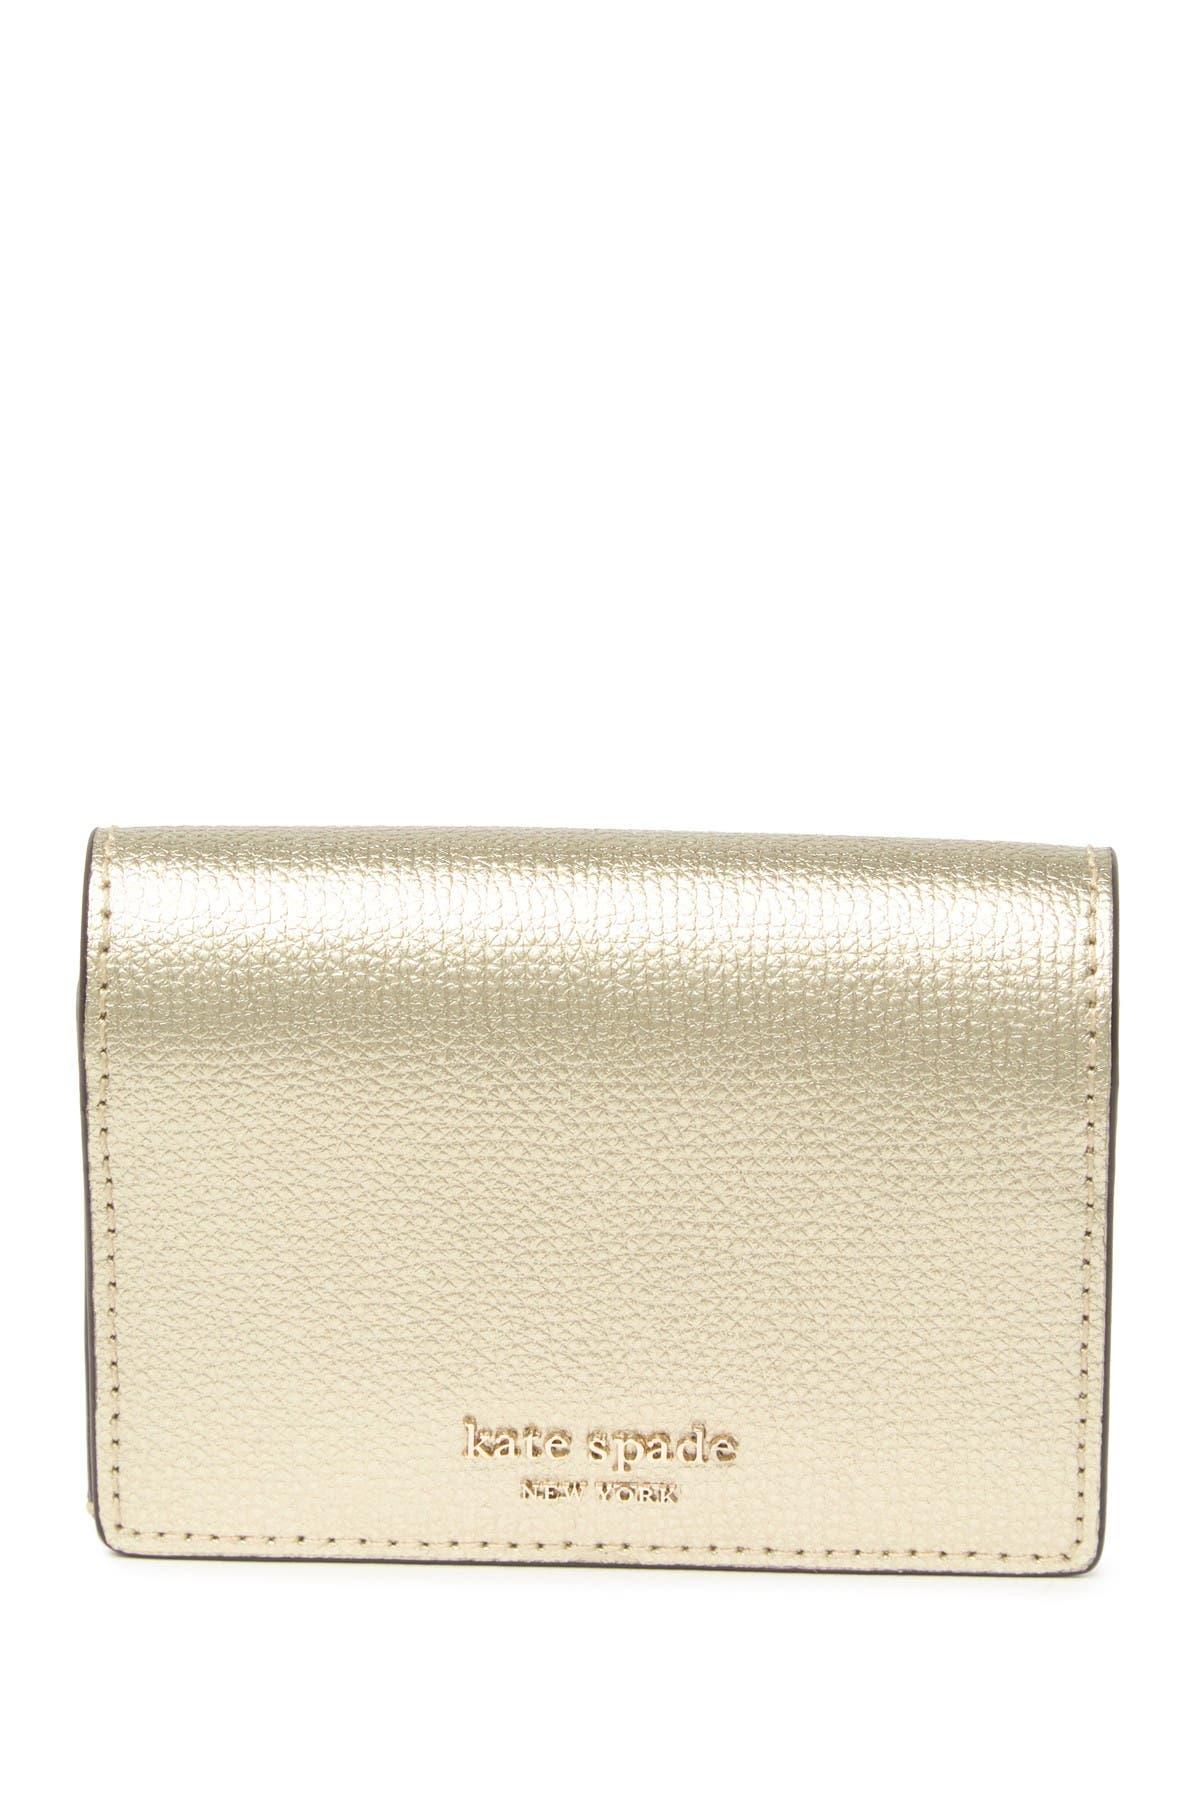 Image of kate spade new york mini key ring wallet